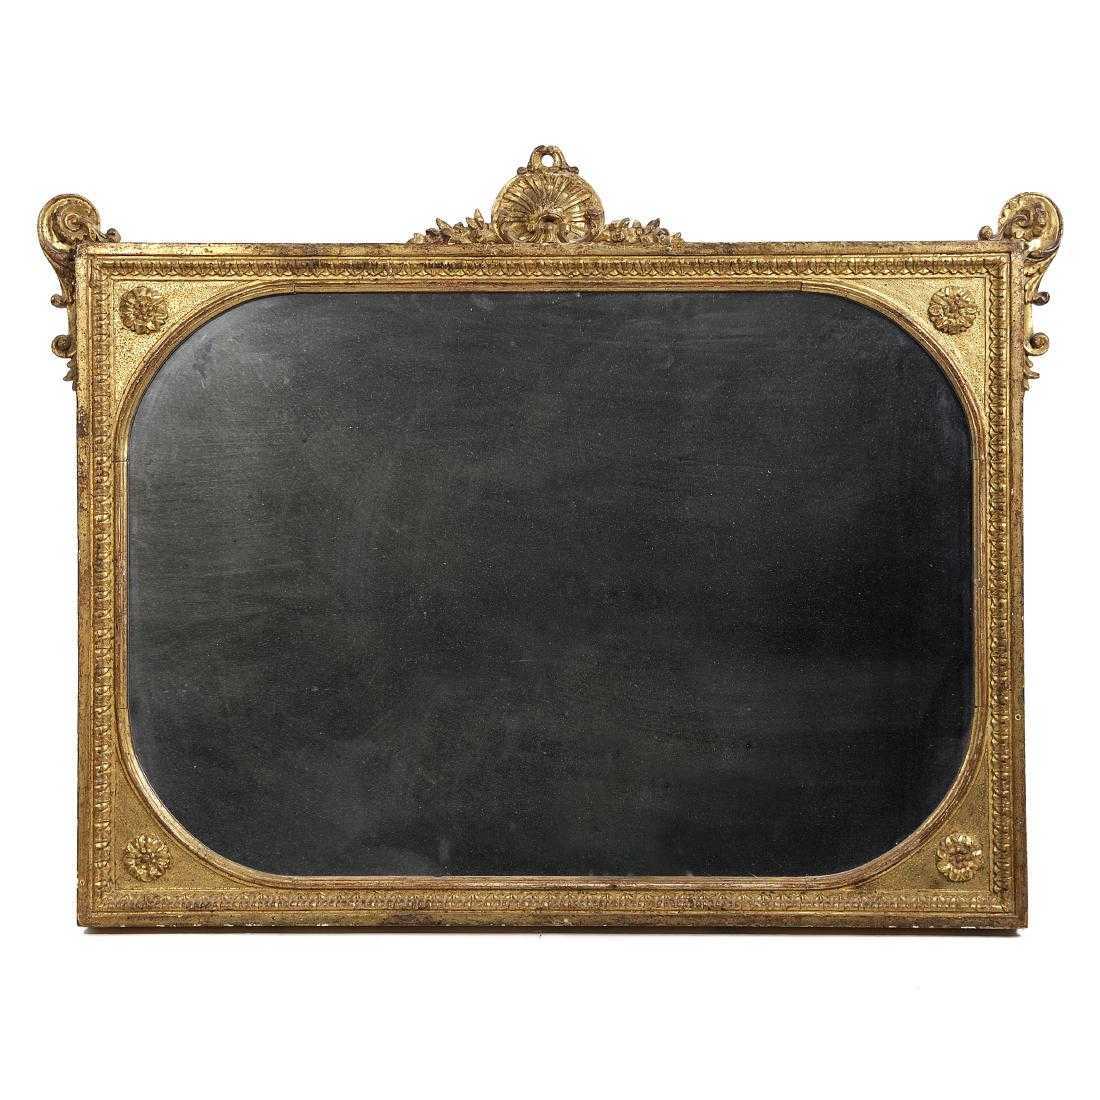 specchiera dorata stile Luigi XVI